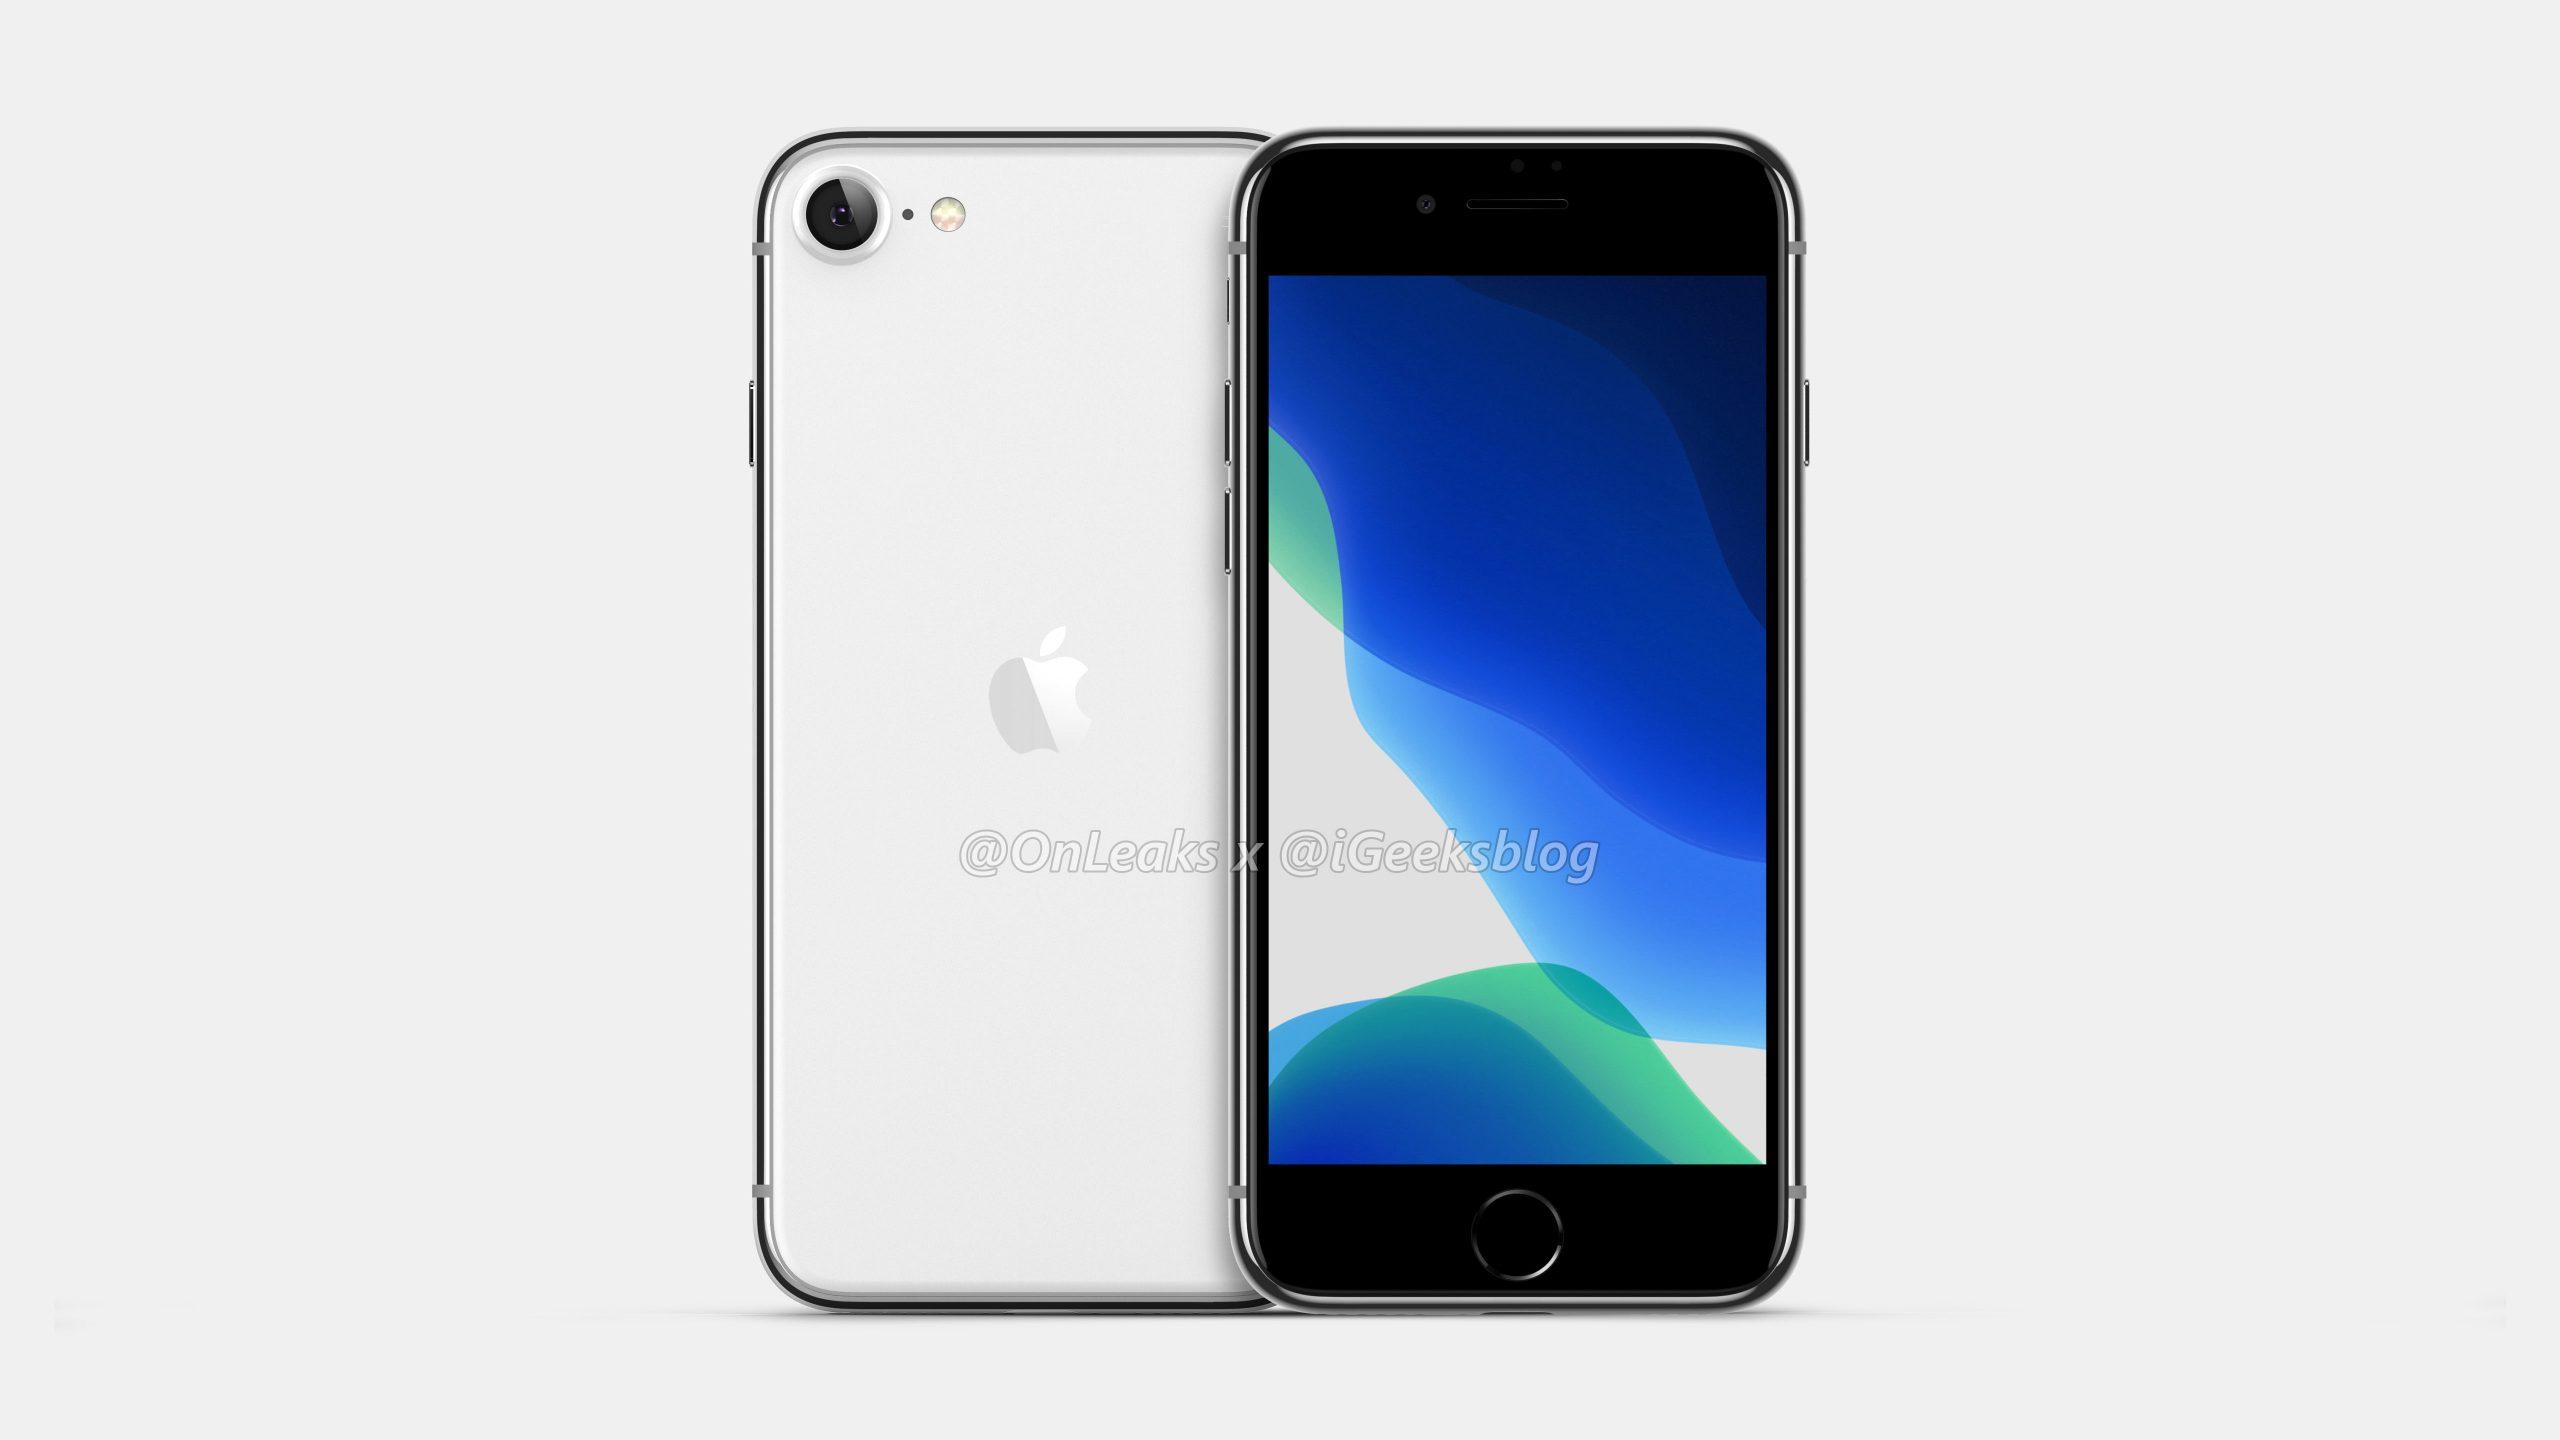 「iPhone SE2」の発売日はやはり3月か。新型iPad Proも?